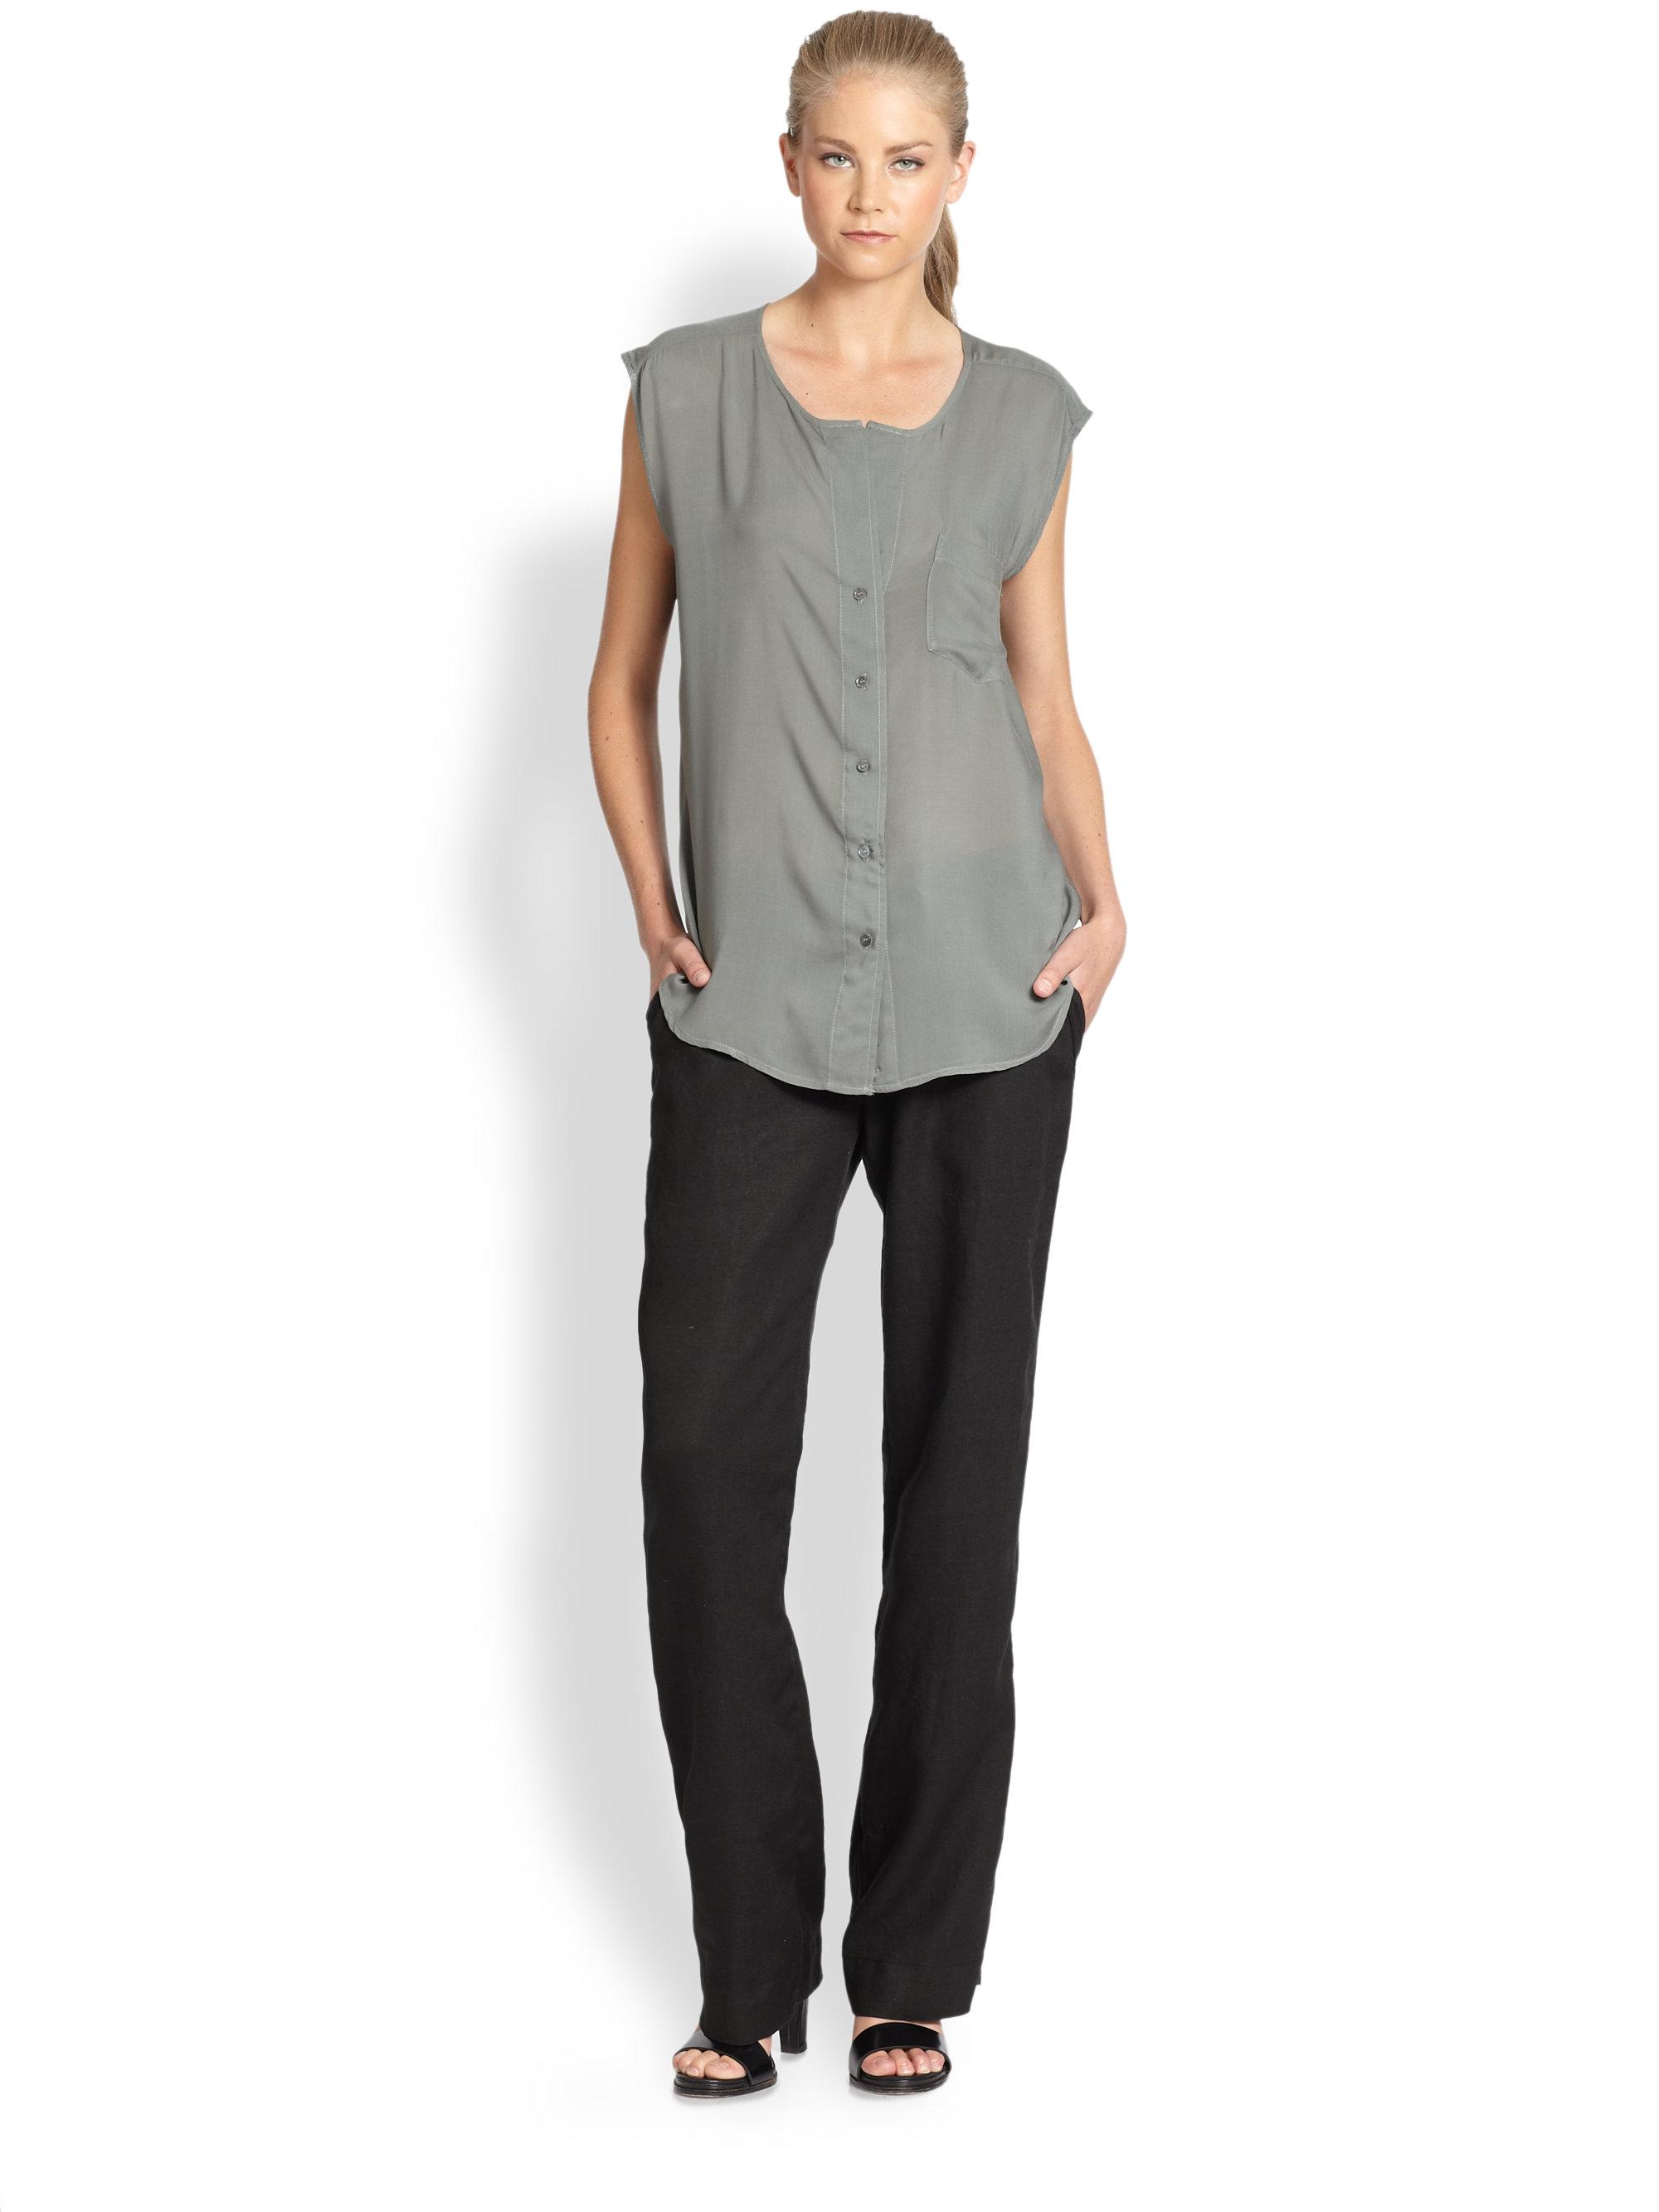 wide leg black linen pants - Pi Pants